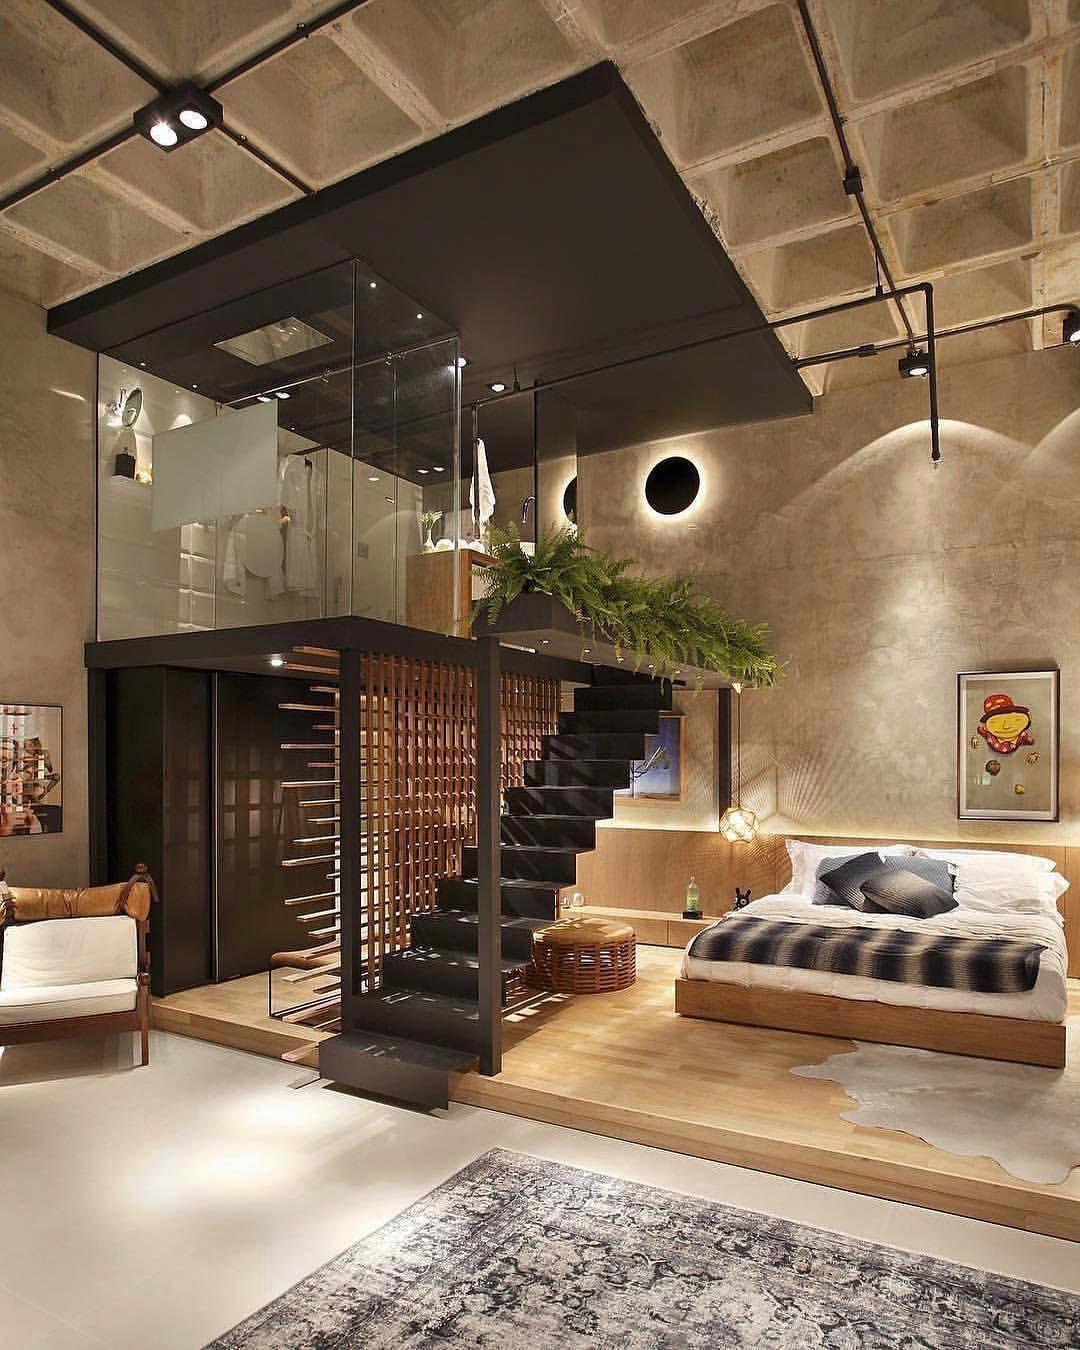 loft design low budget interior design rh ubuuioluoi coloncleanse store